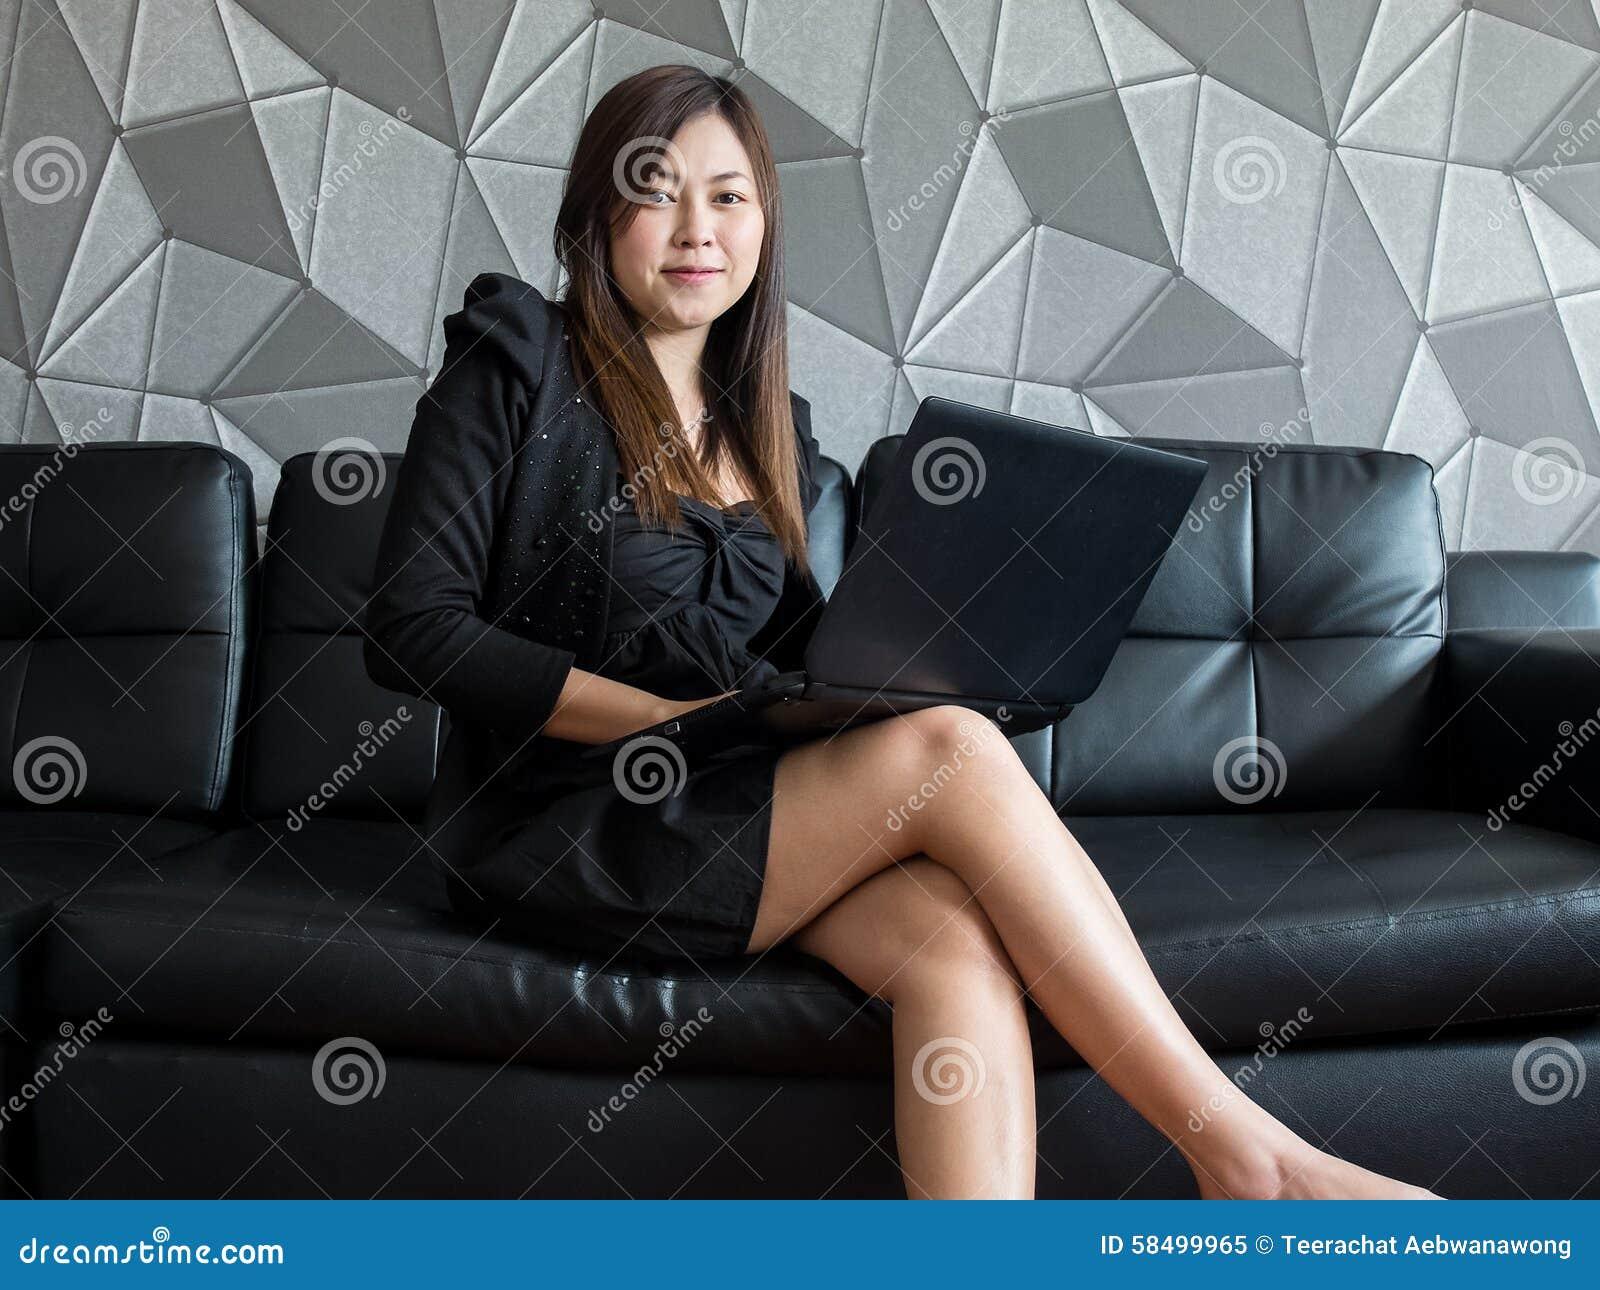 Hacked asian self nude